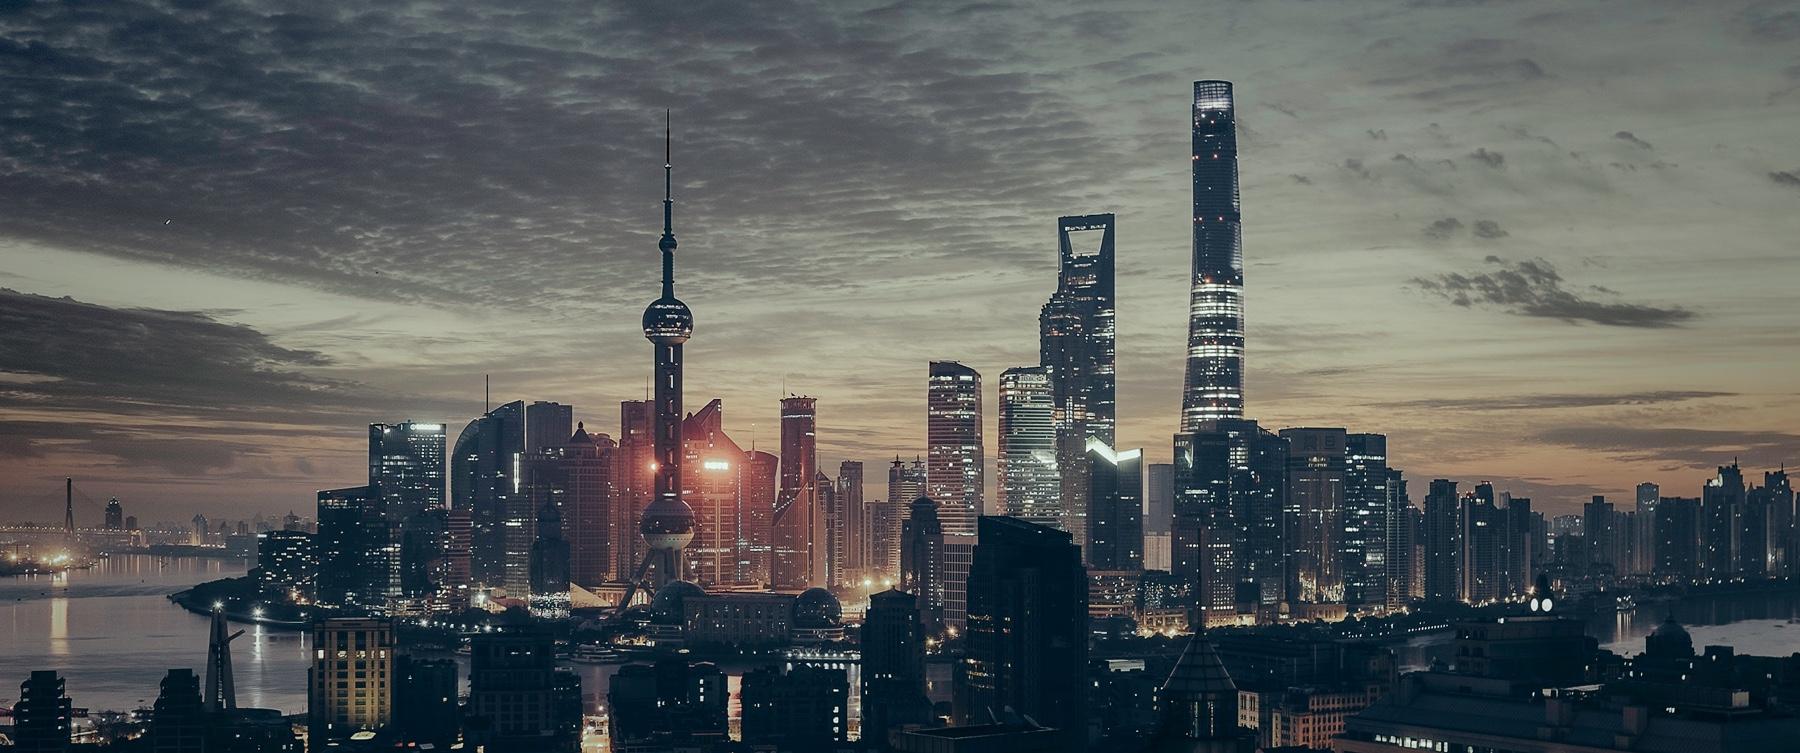 Exploring the Impact of China's Growing Economic Status